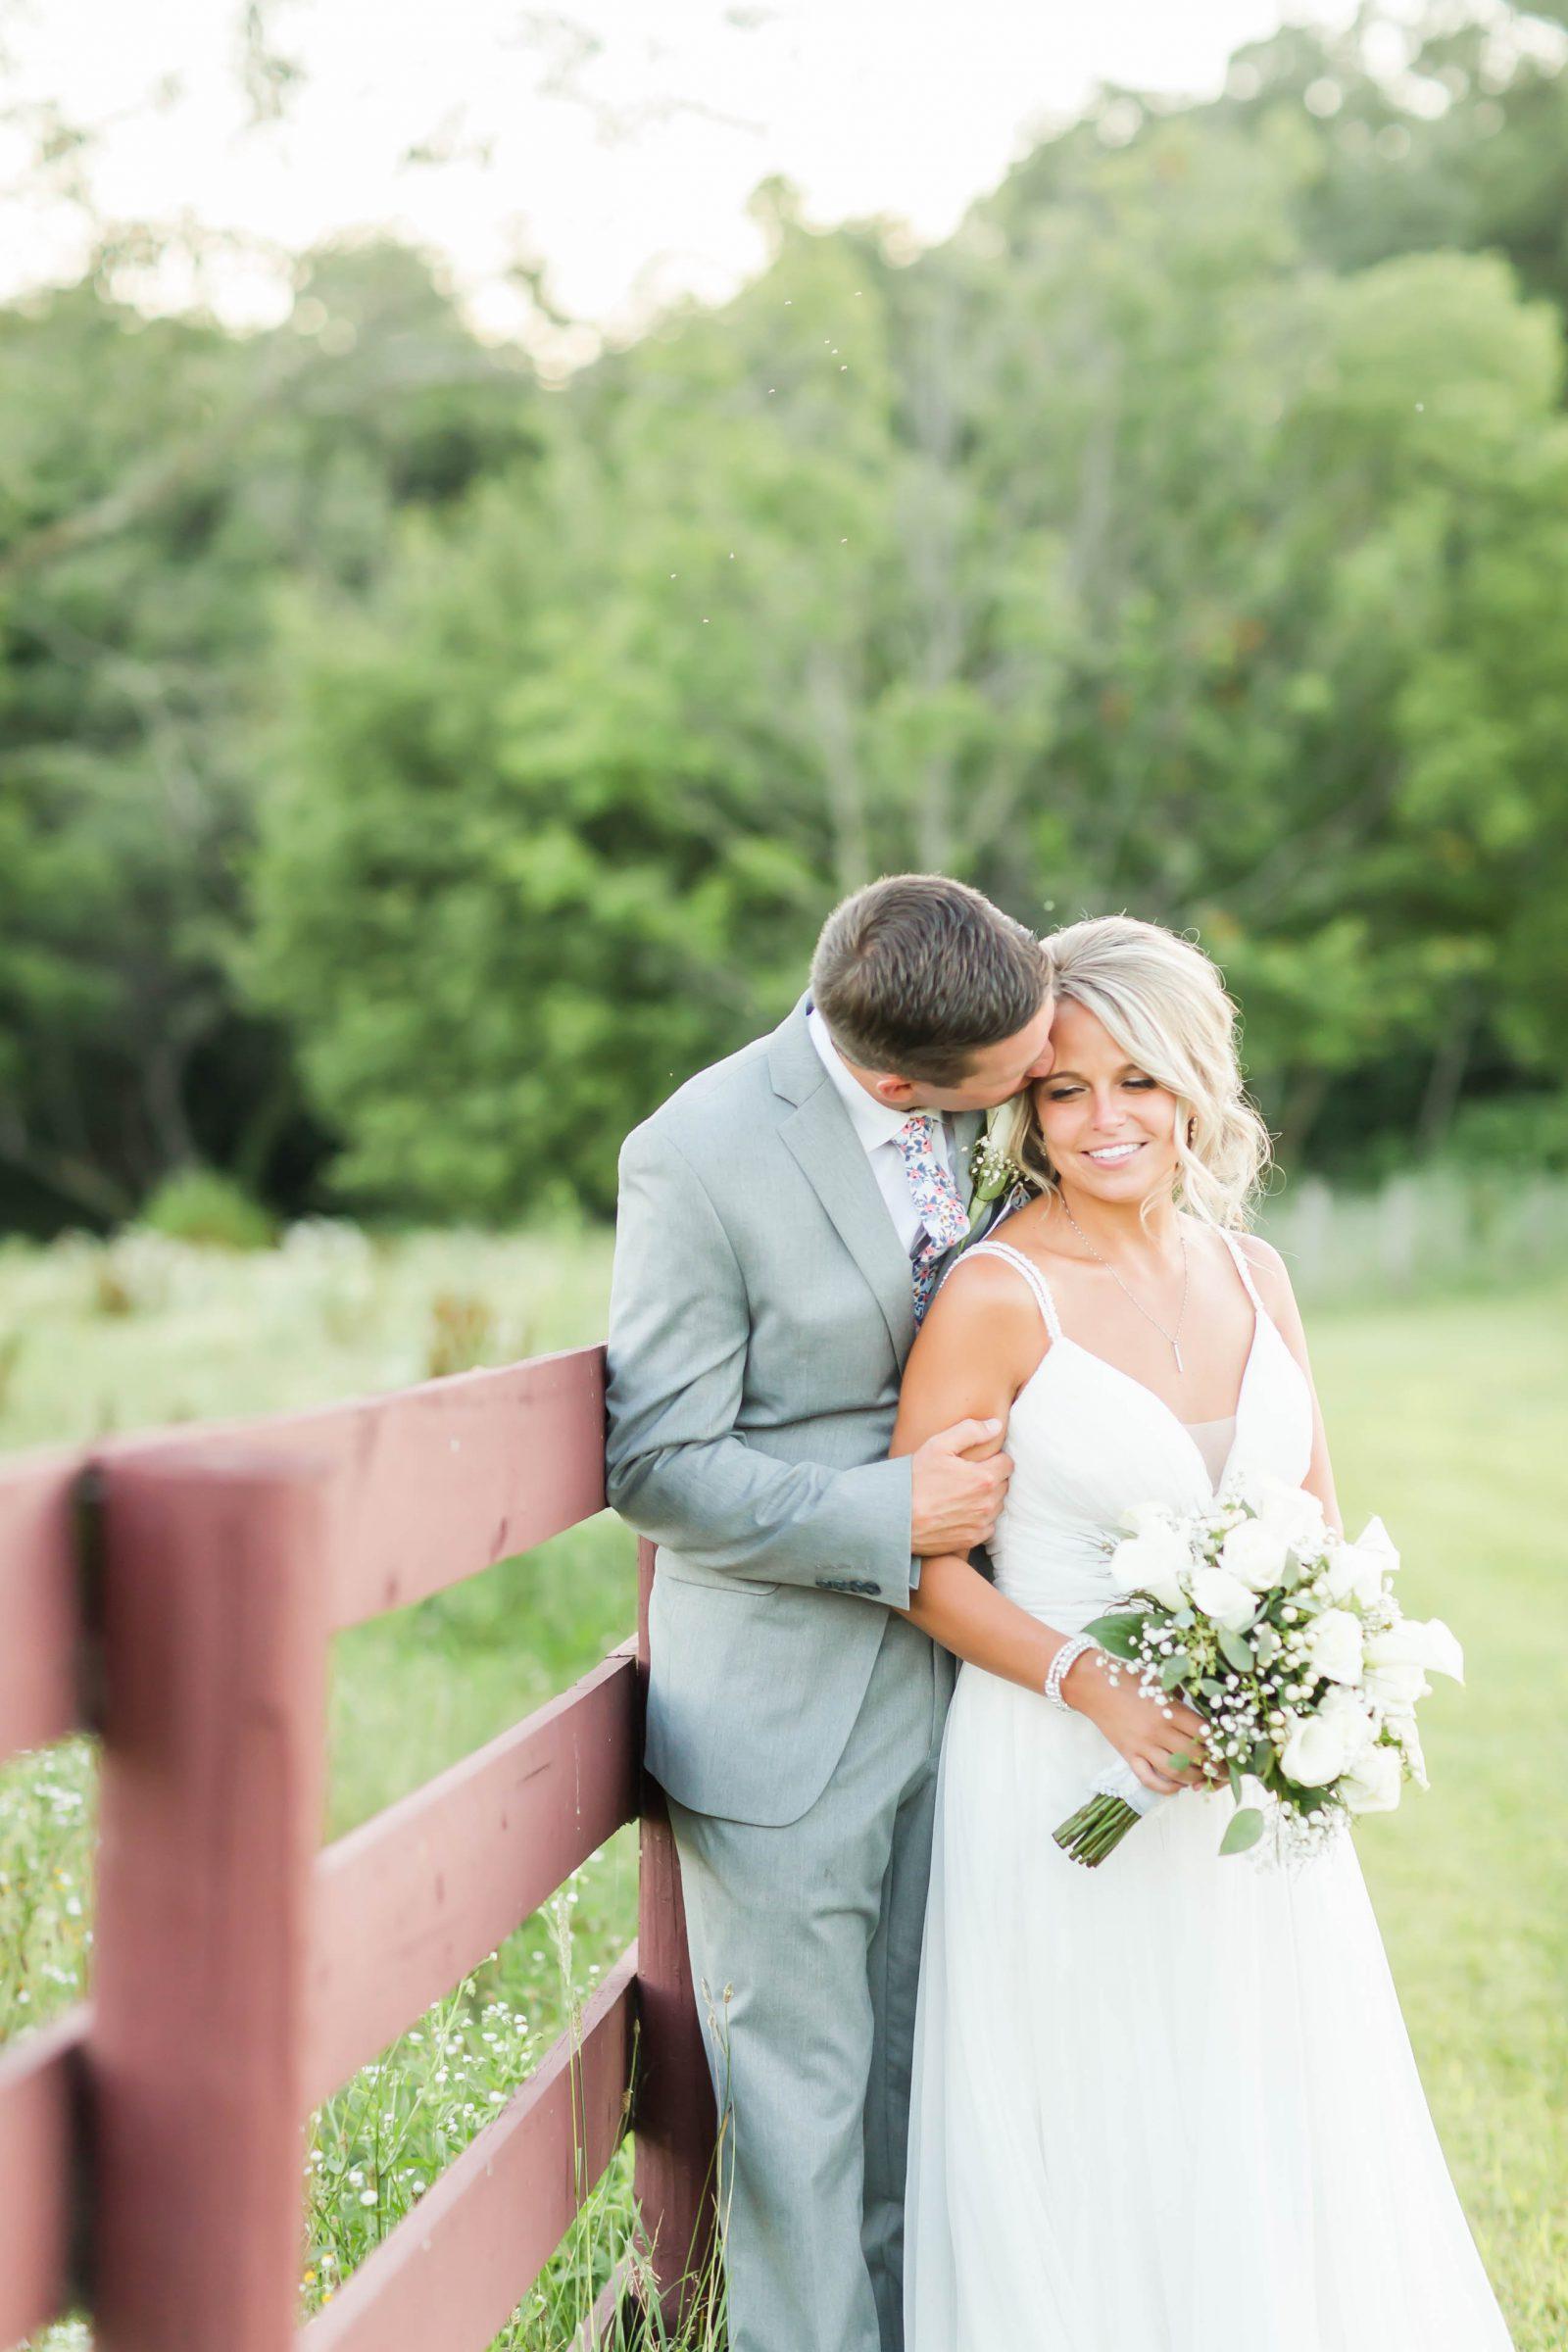 peacock-ridge-summer-wedding-photographer-akron-ohio-loren-jackson-photography-120